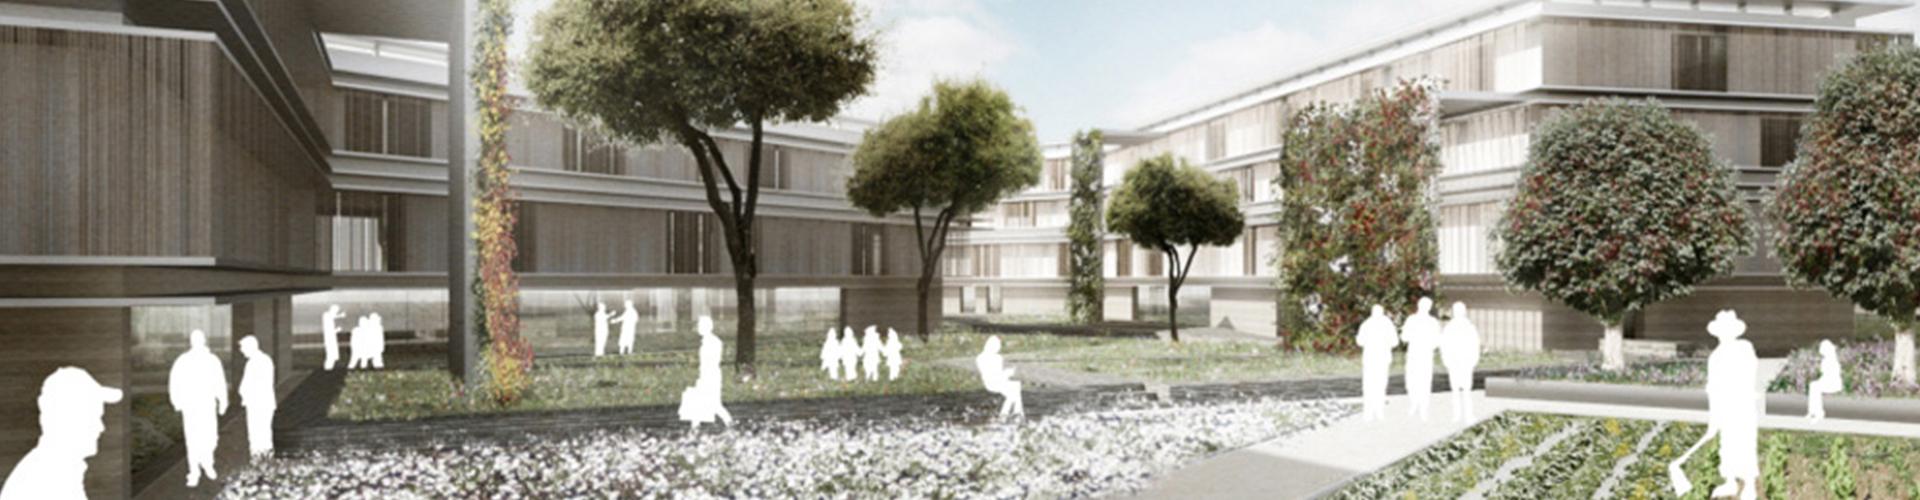 Urban Center Bassano